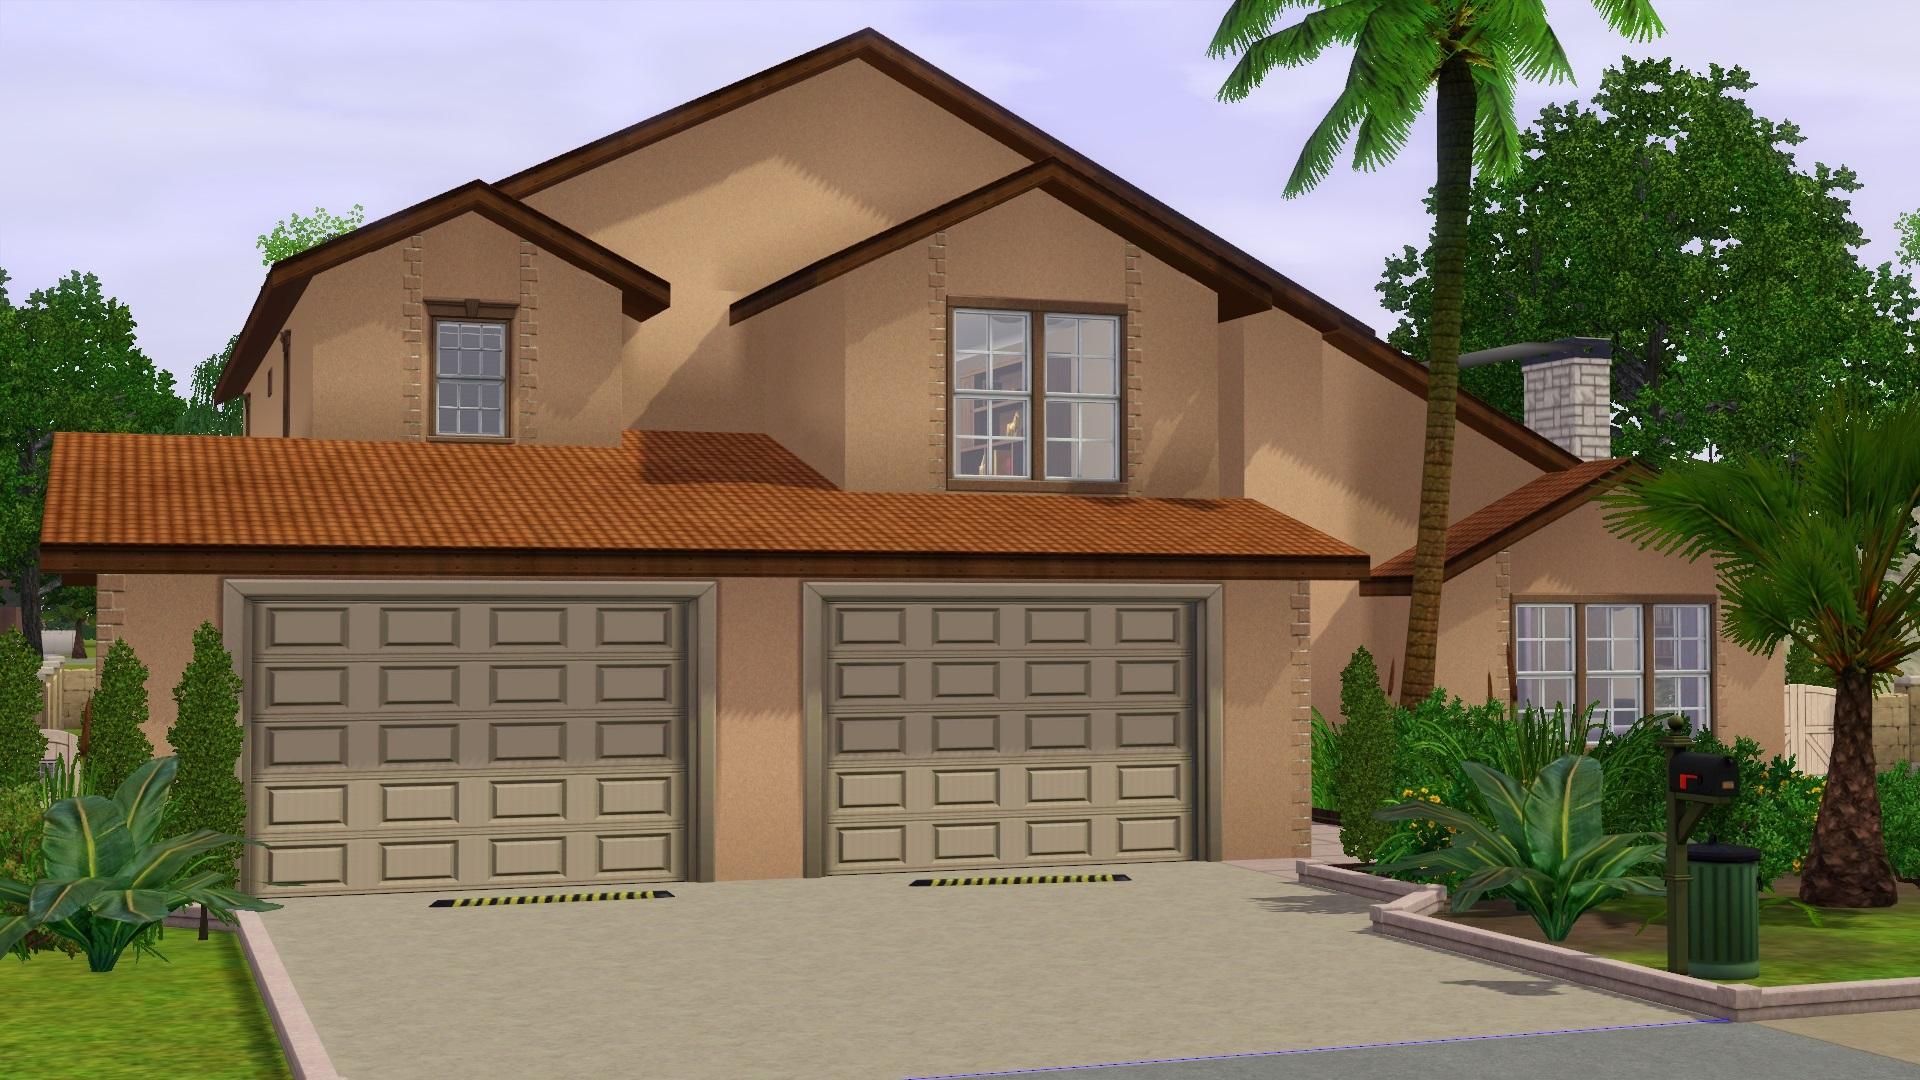 Blueprint Of House With 3 Bedrooms Distinctive bedroom design blue design kitchen